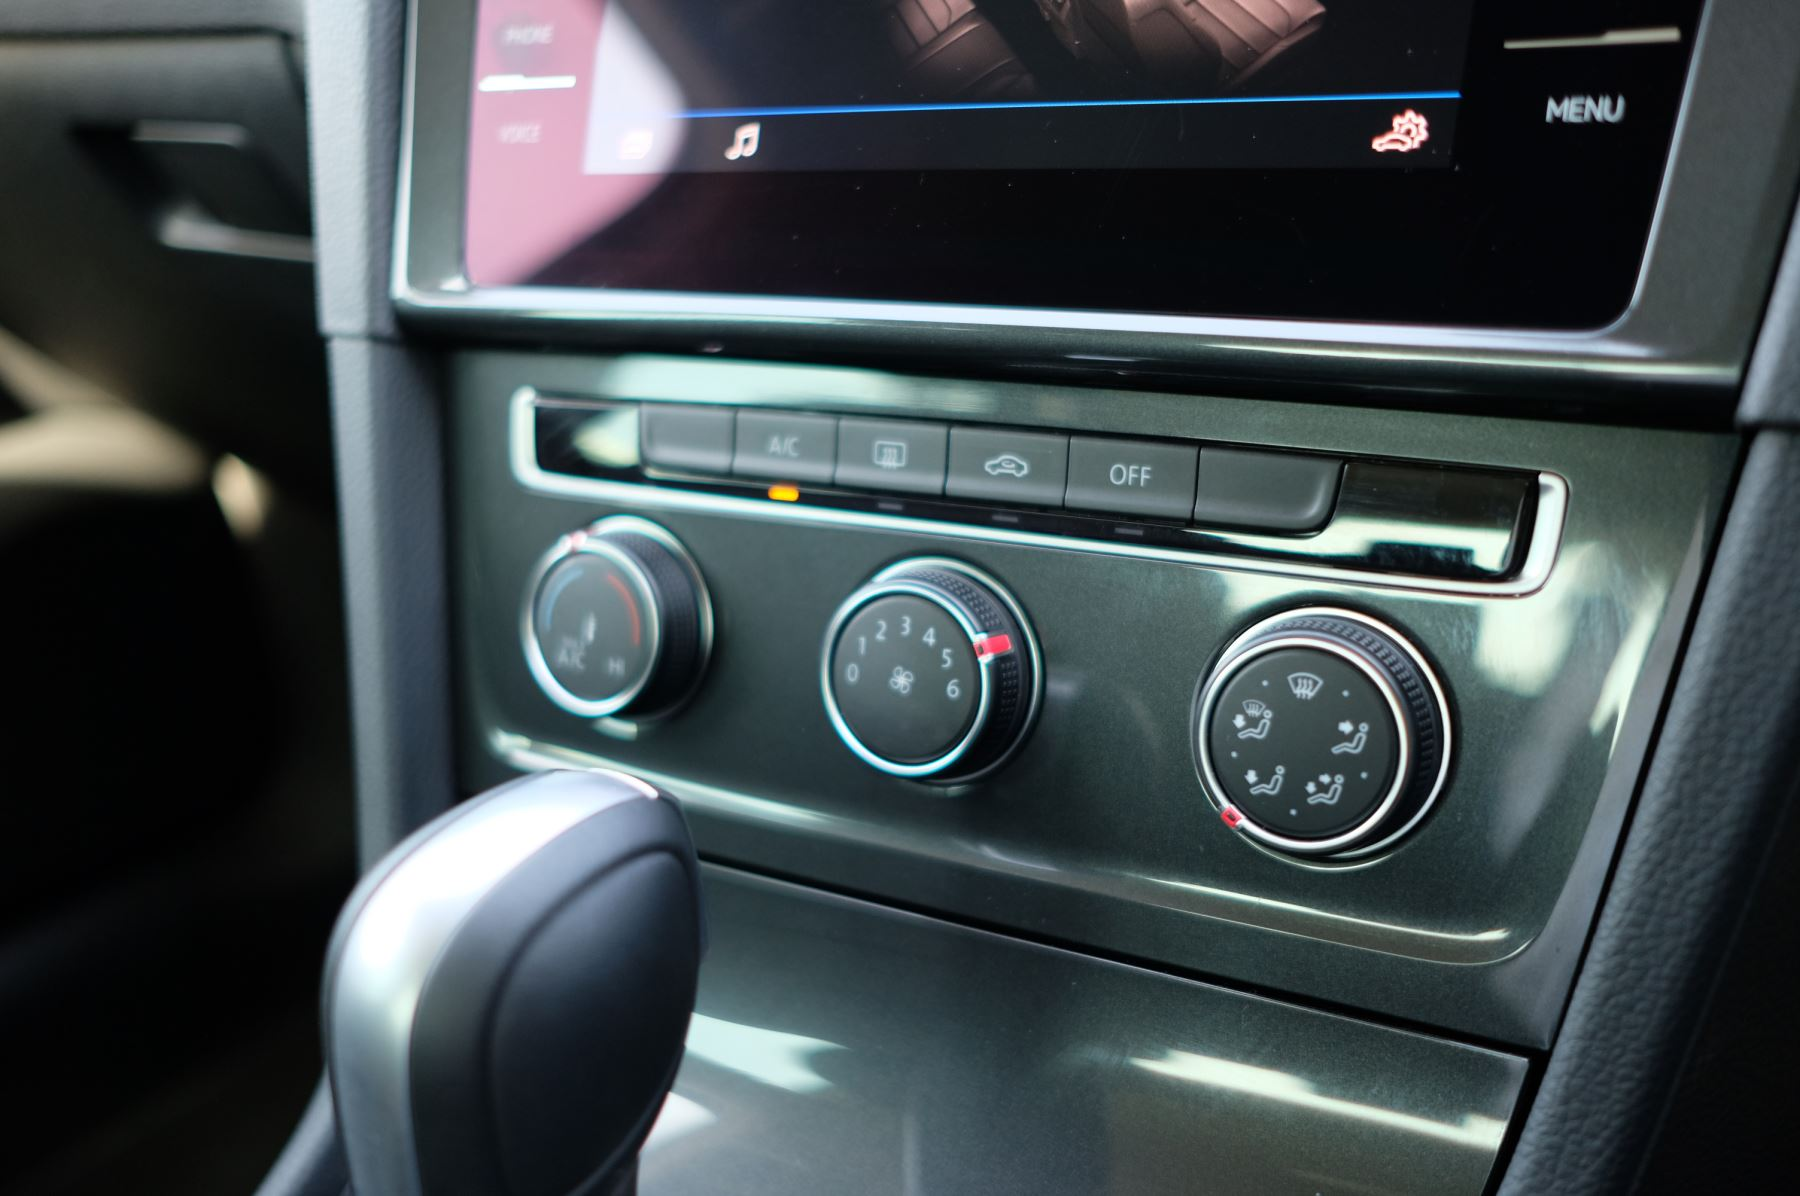 Volkswagen Golf 1.5 TSI EVO 150hp Match 5 Door DSG Auto with A/Con, Sat Nav, Alloys & Adaptive Cruise  image 19